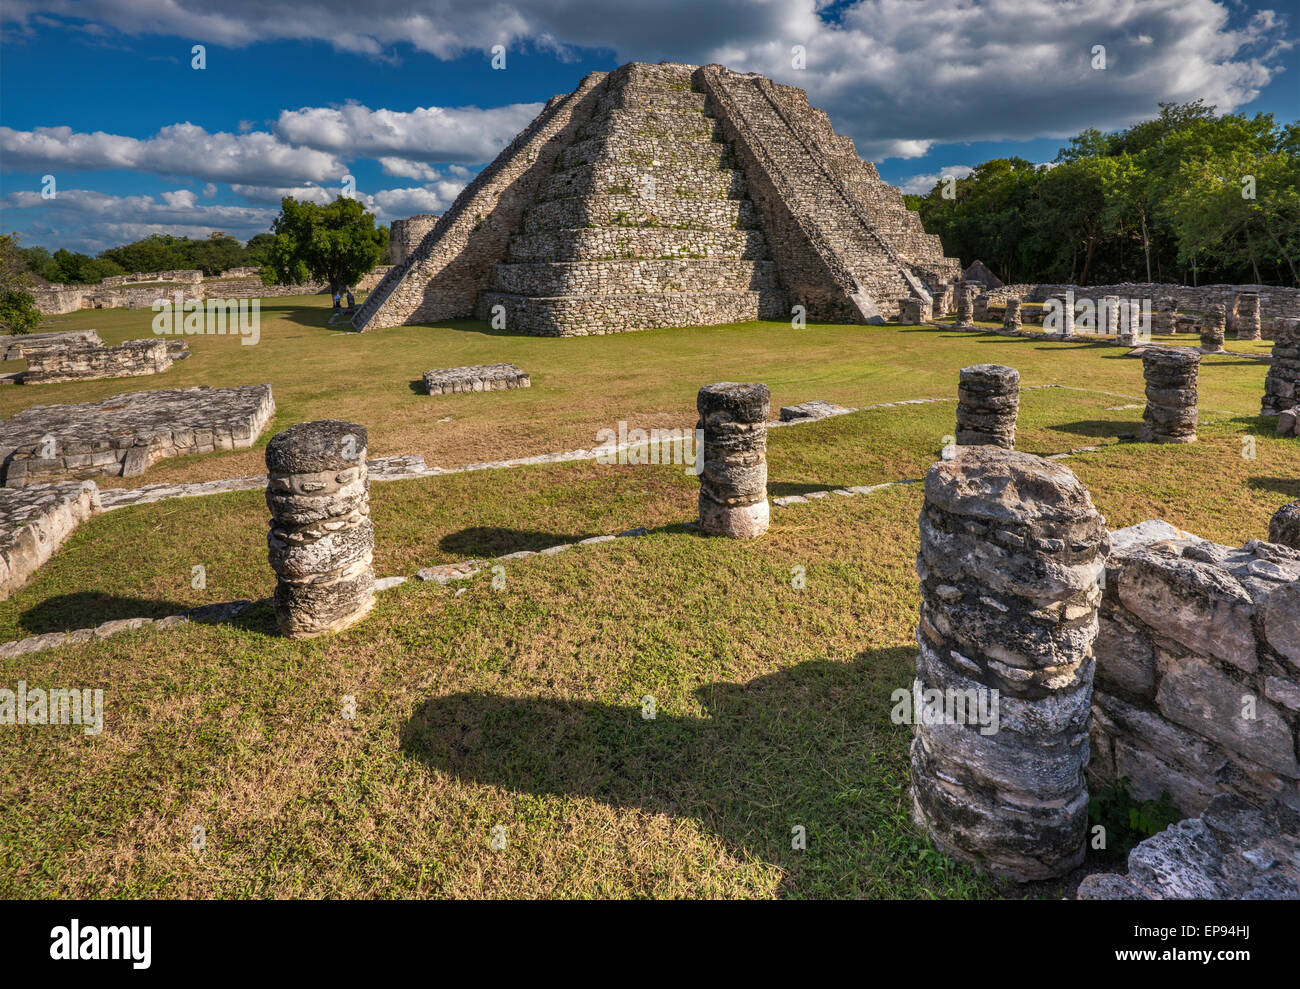 El Castillo de Kukulcan (Temple of Kukulcan), pyramid, Maya ruins at Mayapan archaelogical site, Yucatan state, - Stock Image